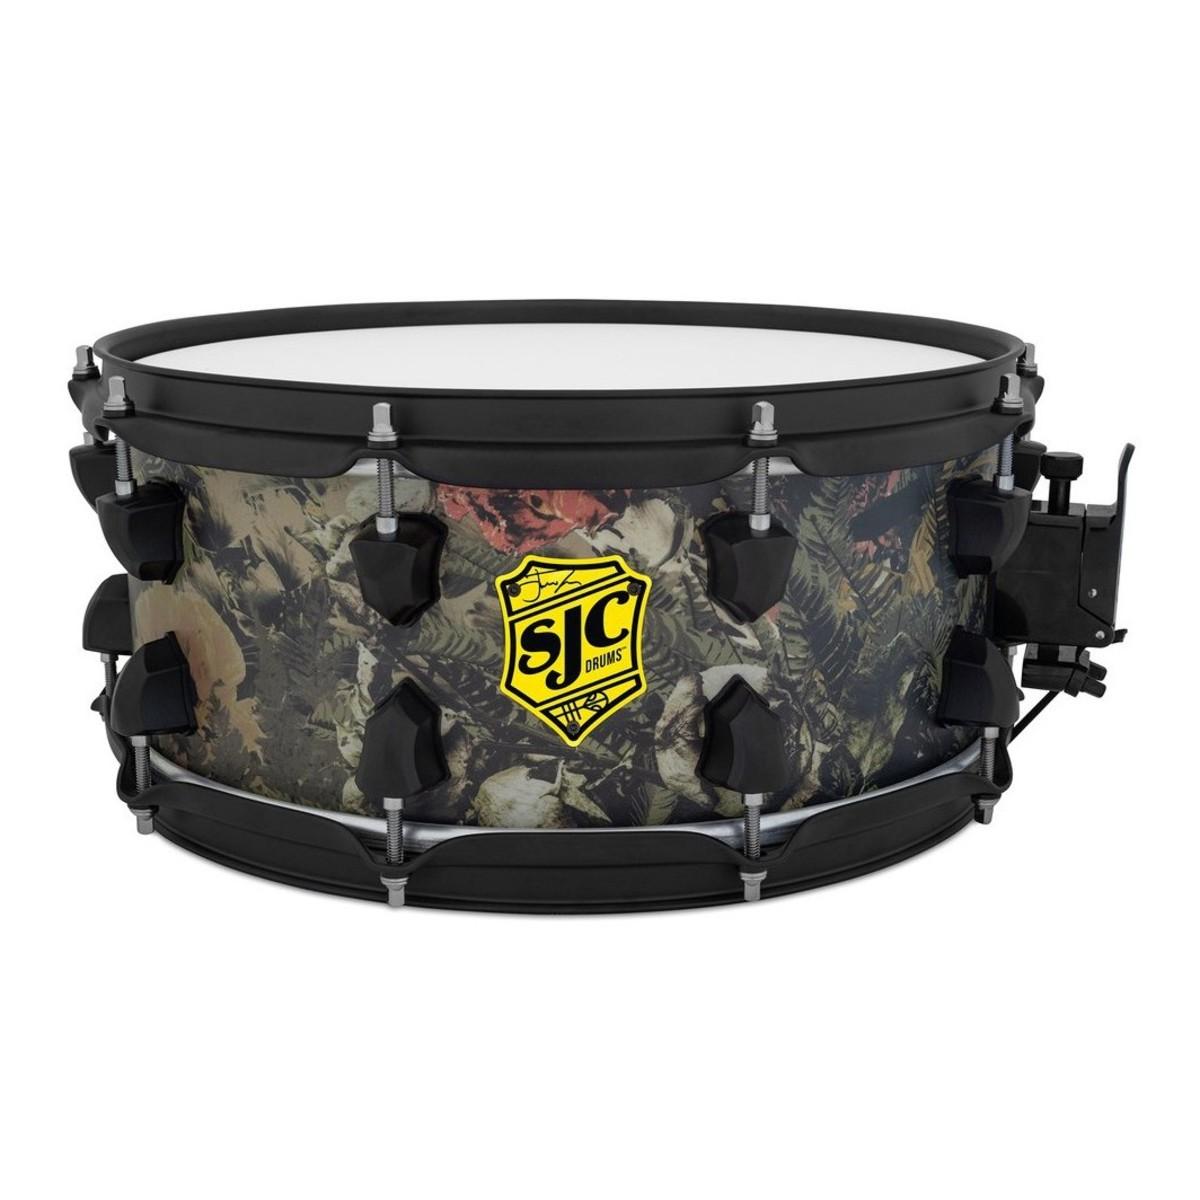 SJC Drums Josh Dun 14 x 6 ''Trench Camo'' Snare Drum, Black HW